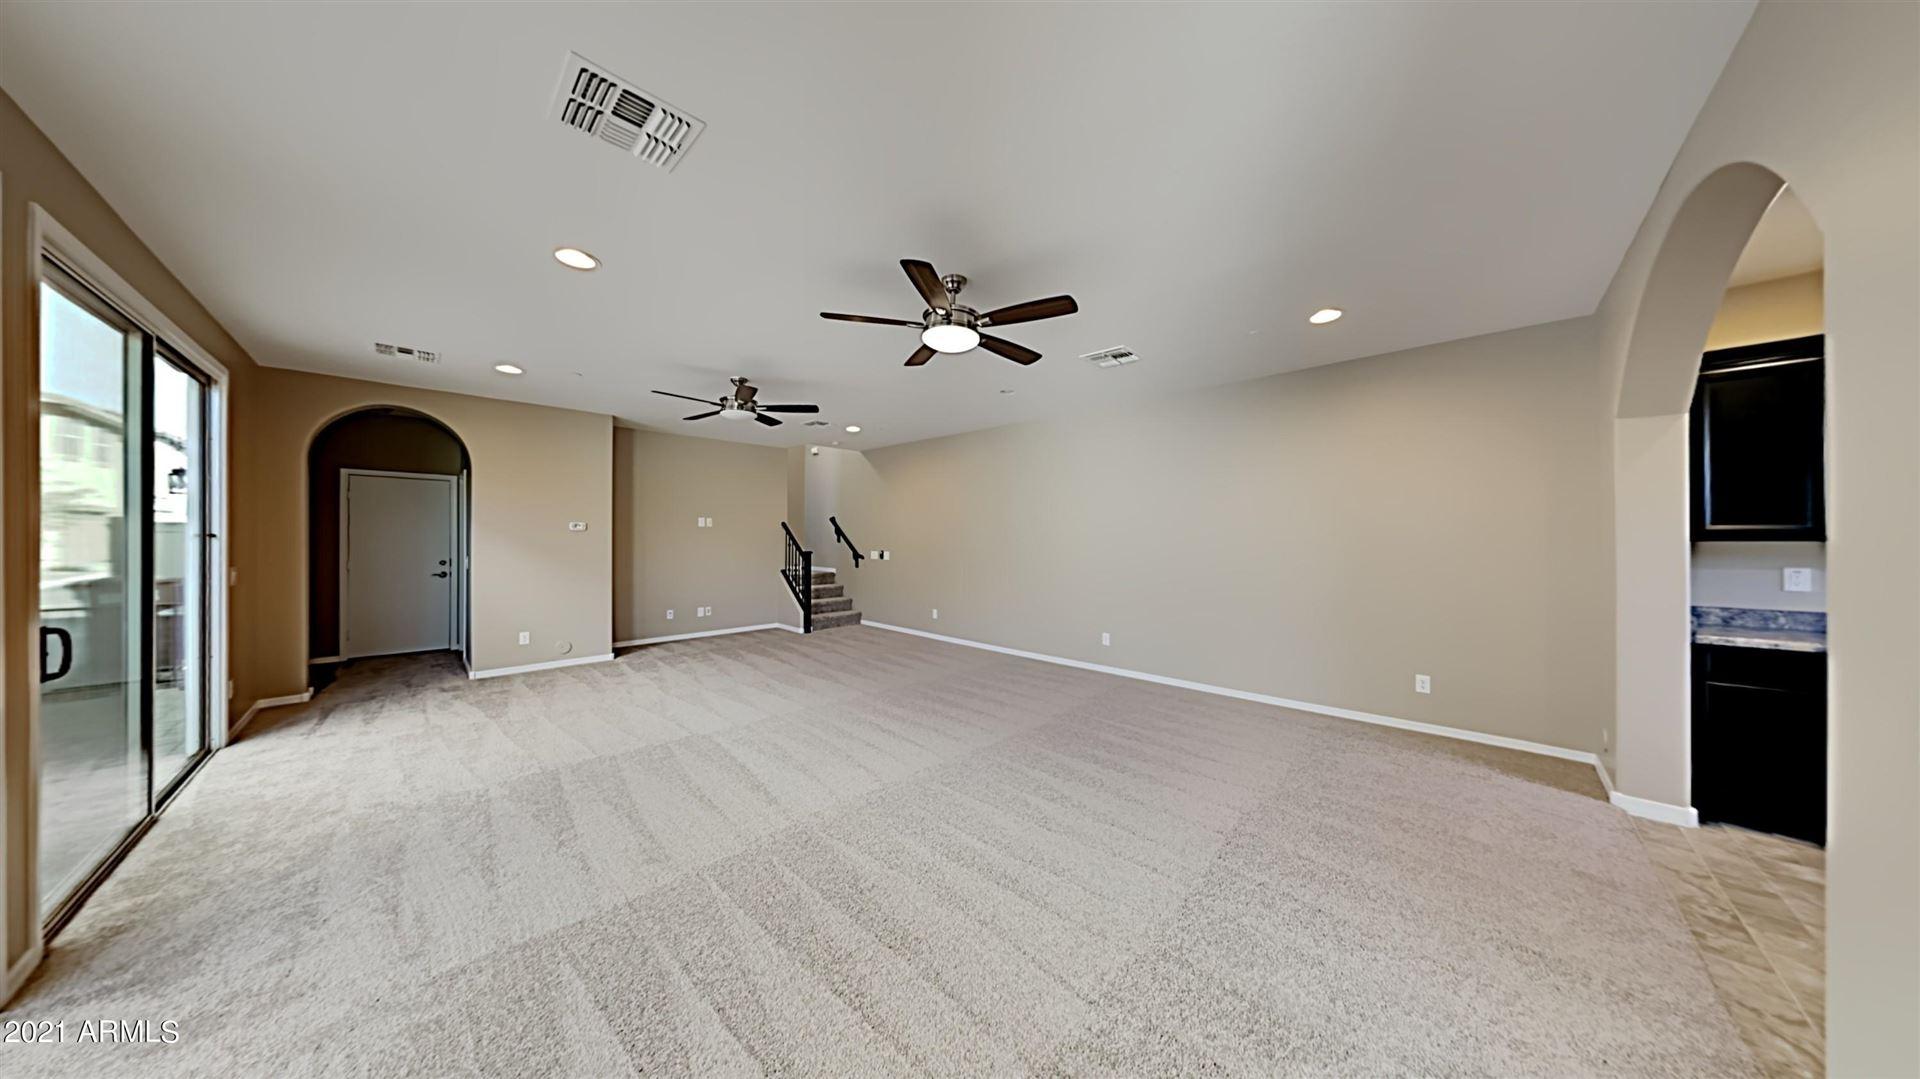 Photo of 12521 W VIA DONA Road, Peoria, AZ 85383 (MLS # 6249720)